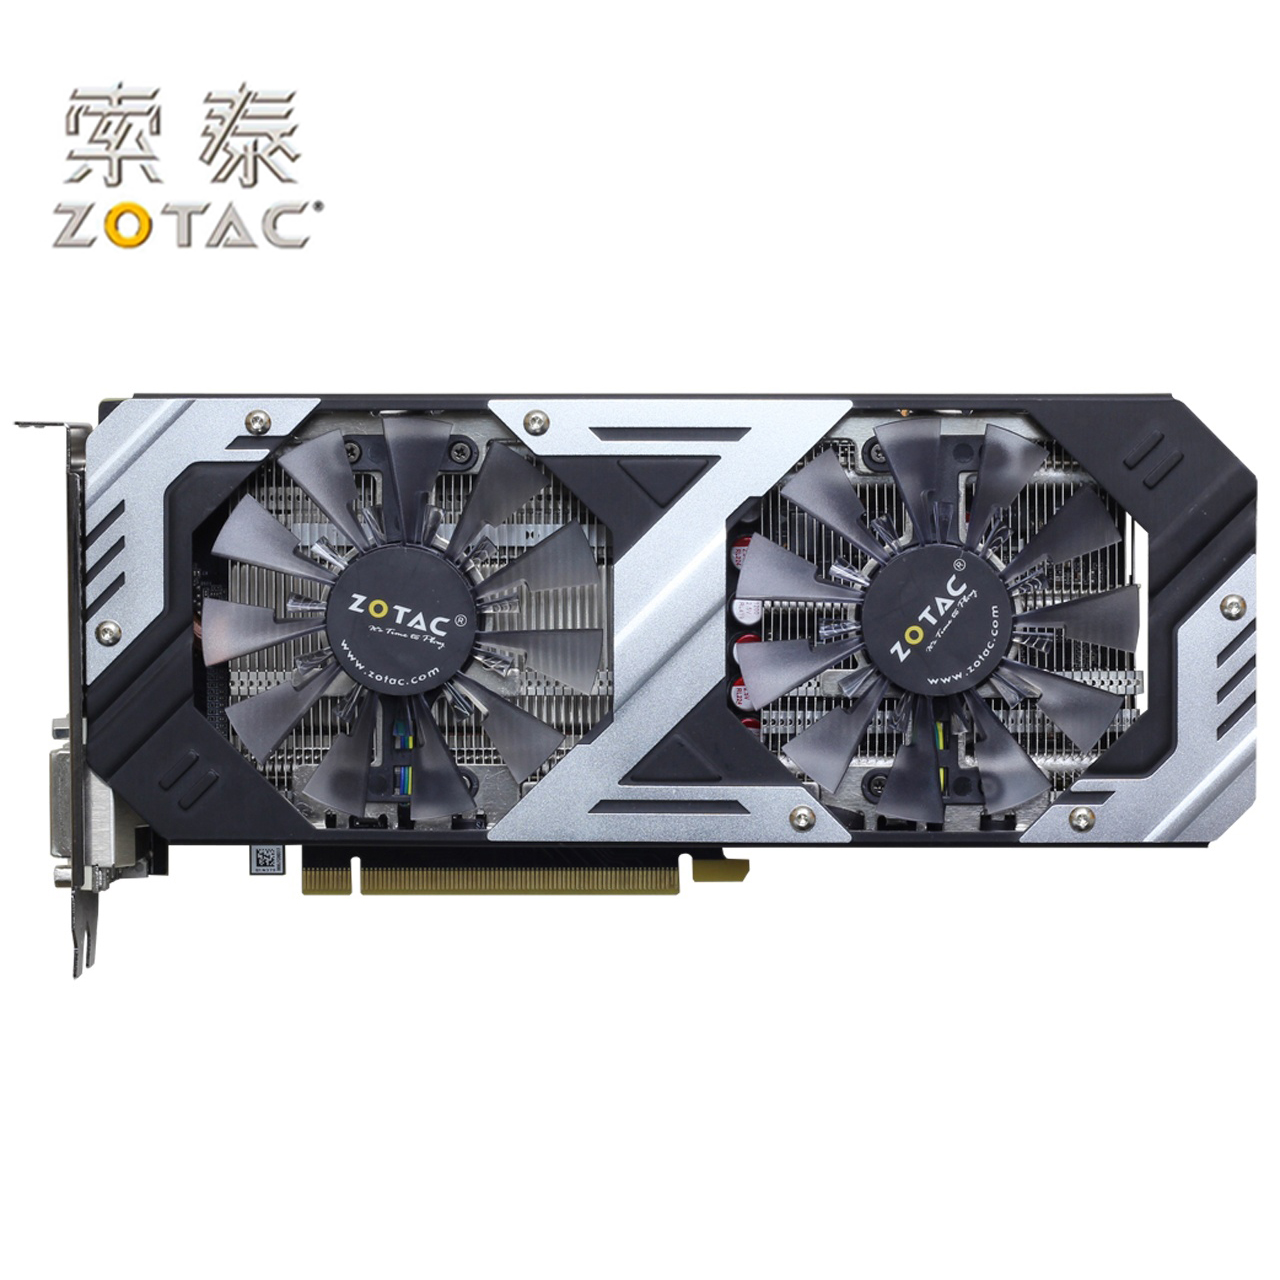 Original ZOTAC GeForce GTX960-4GD5 Graphics Card Thunderbolt HA For NVIDIA GTX900 GTX960 4GD5 4G Video Cards 7010MHz GM206 Used